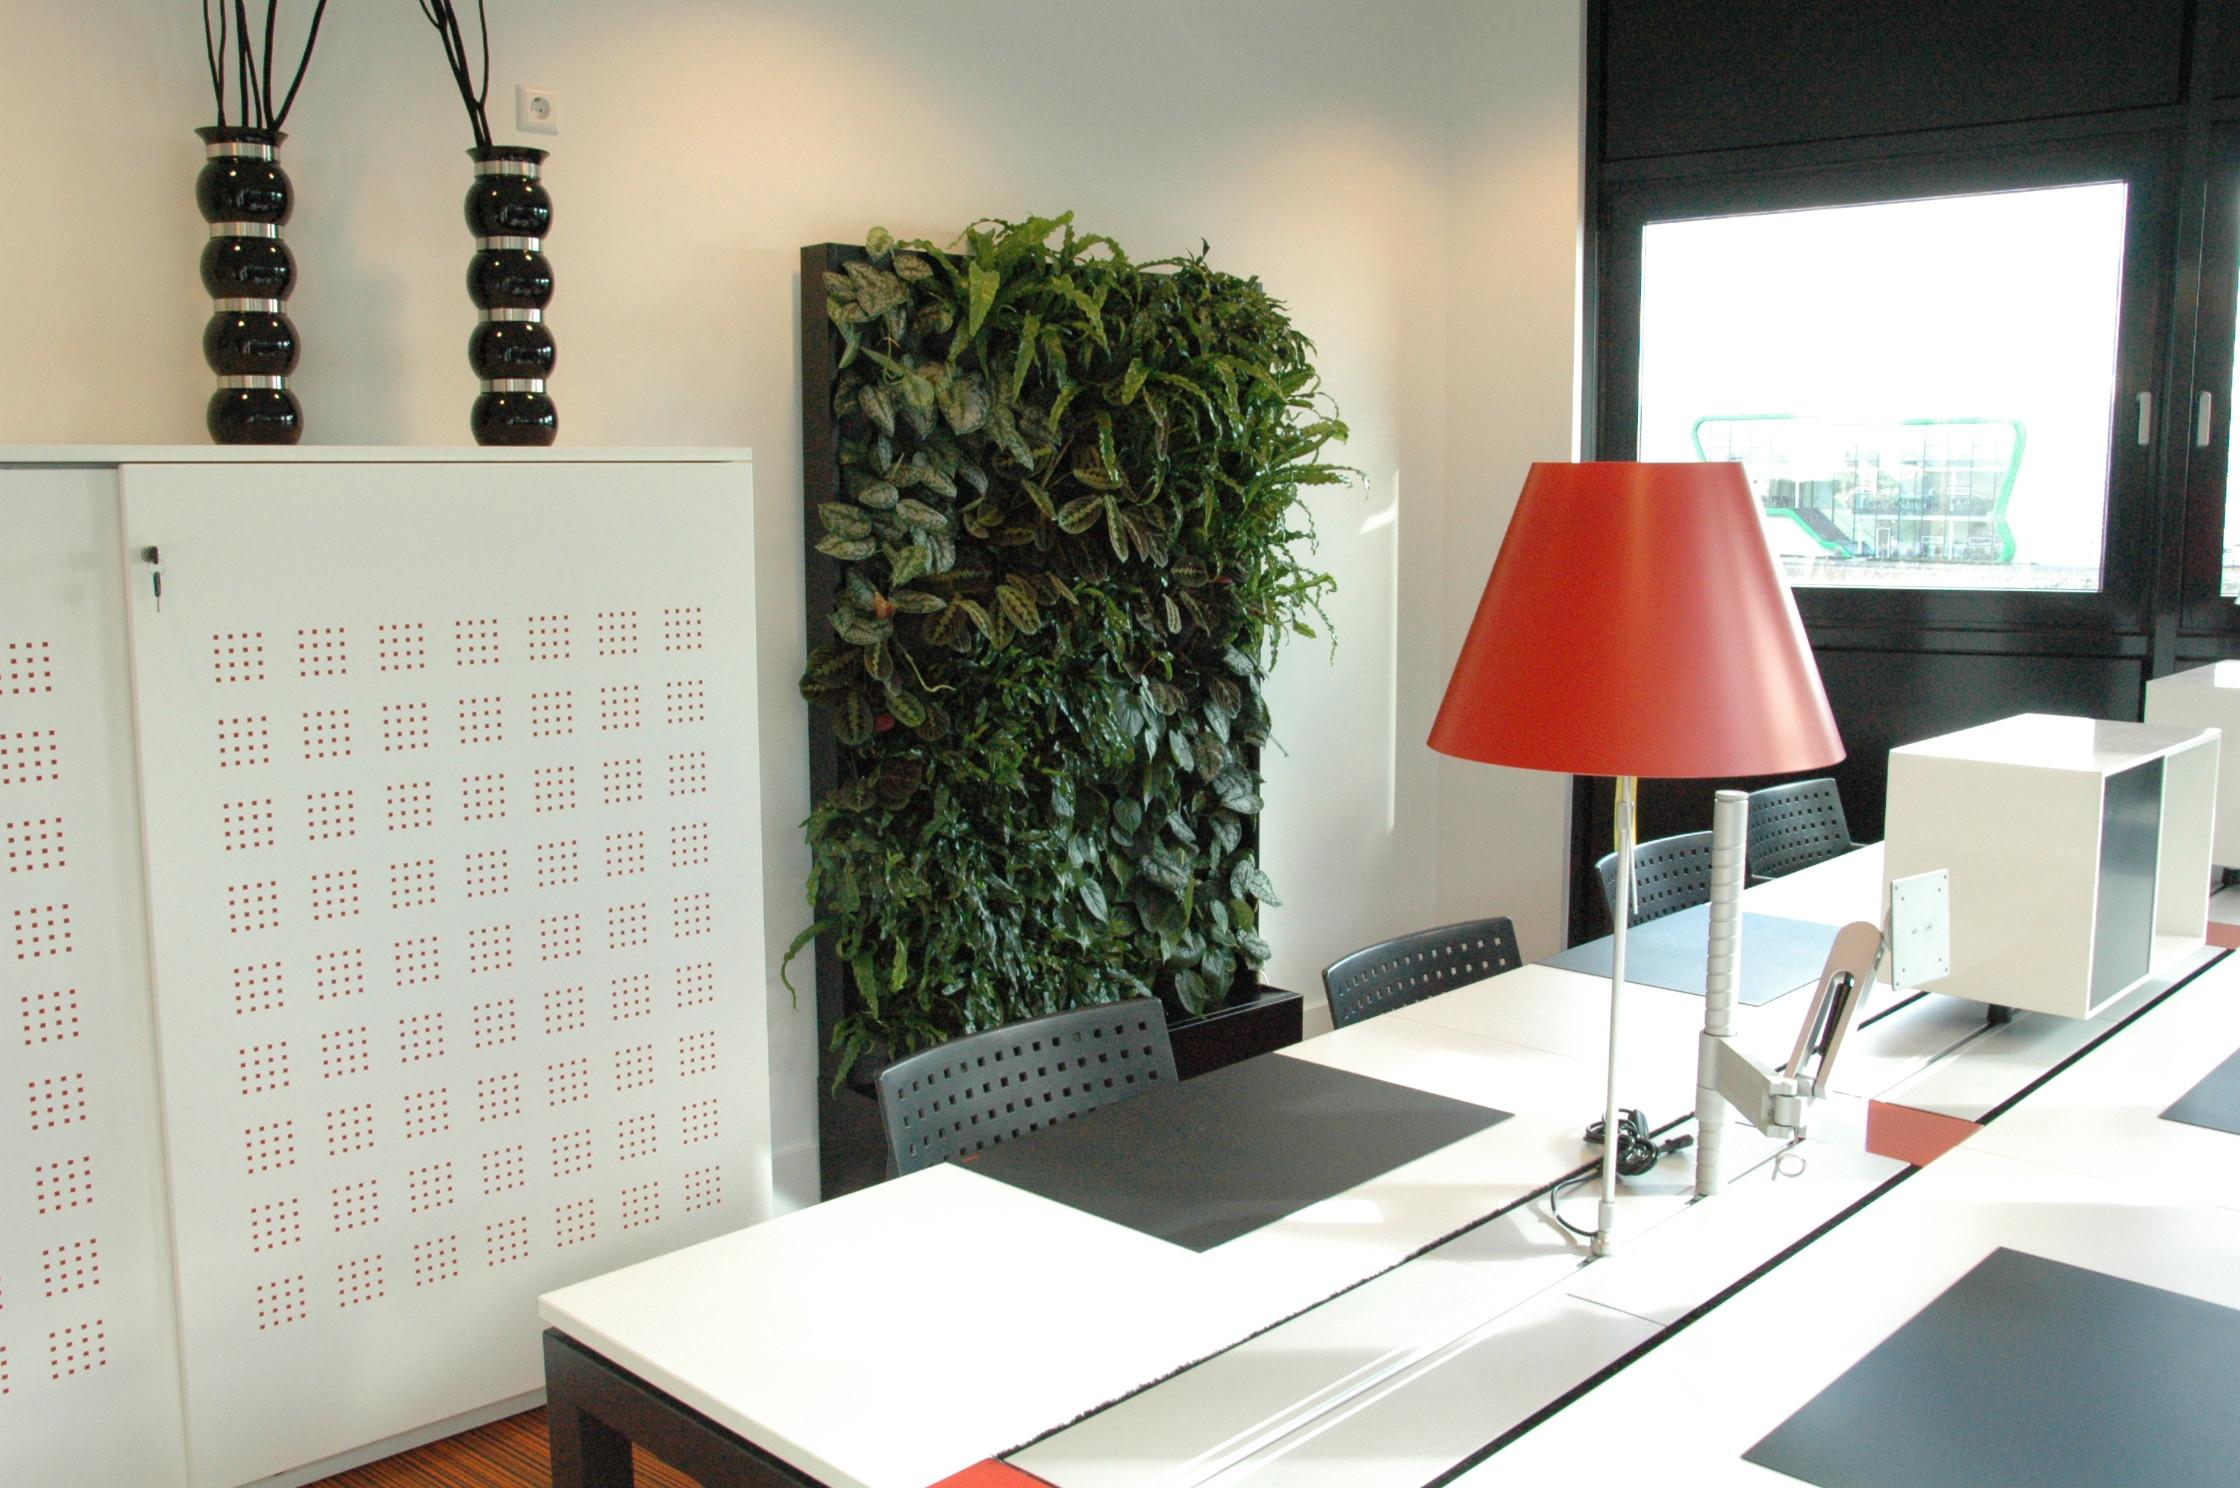 Groene Wand Woonkamer : Plantenwand woonkamer rustic shelving unit chic industrial